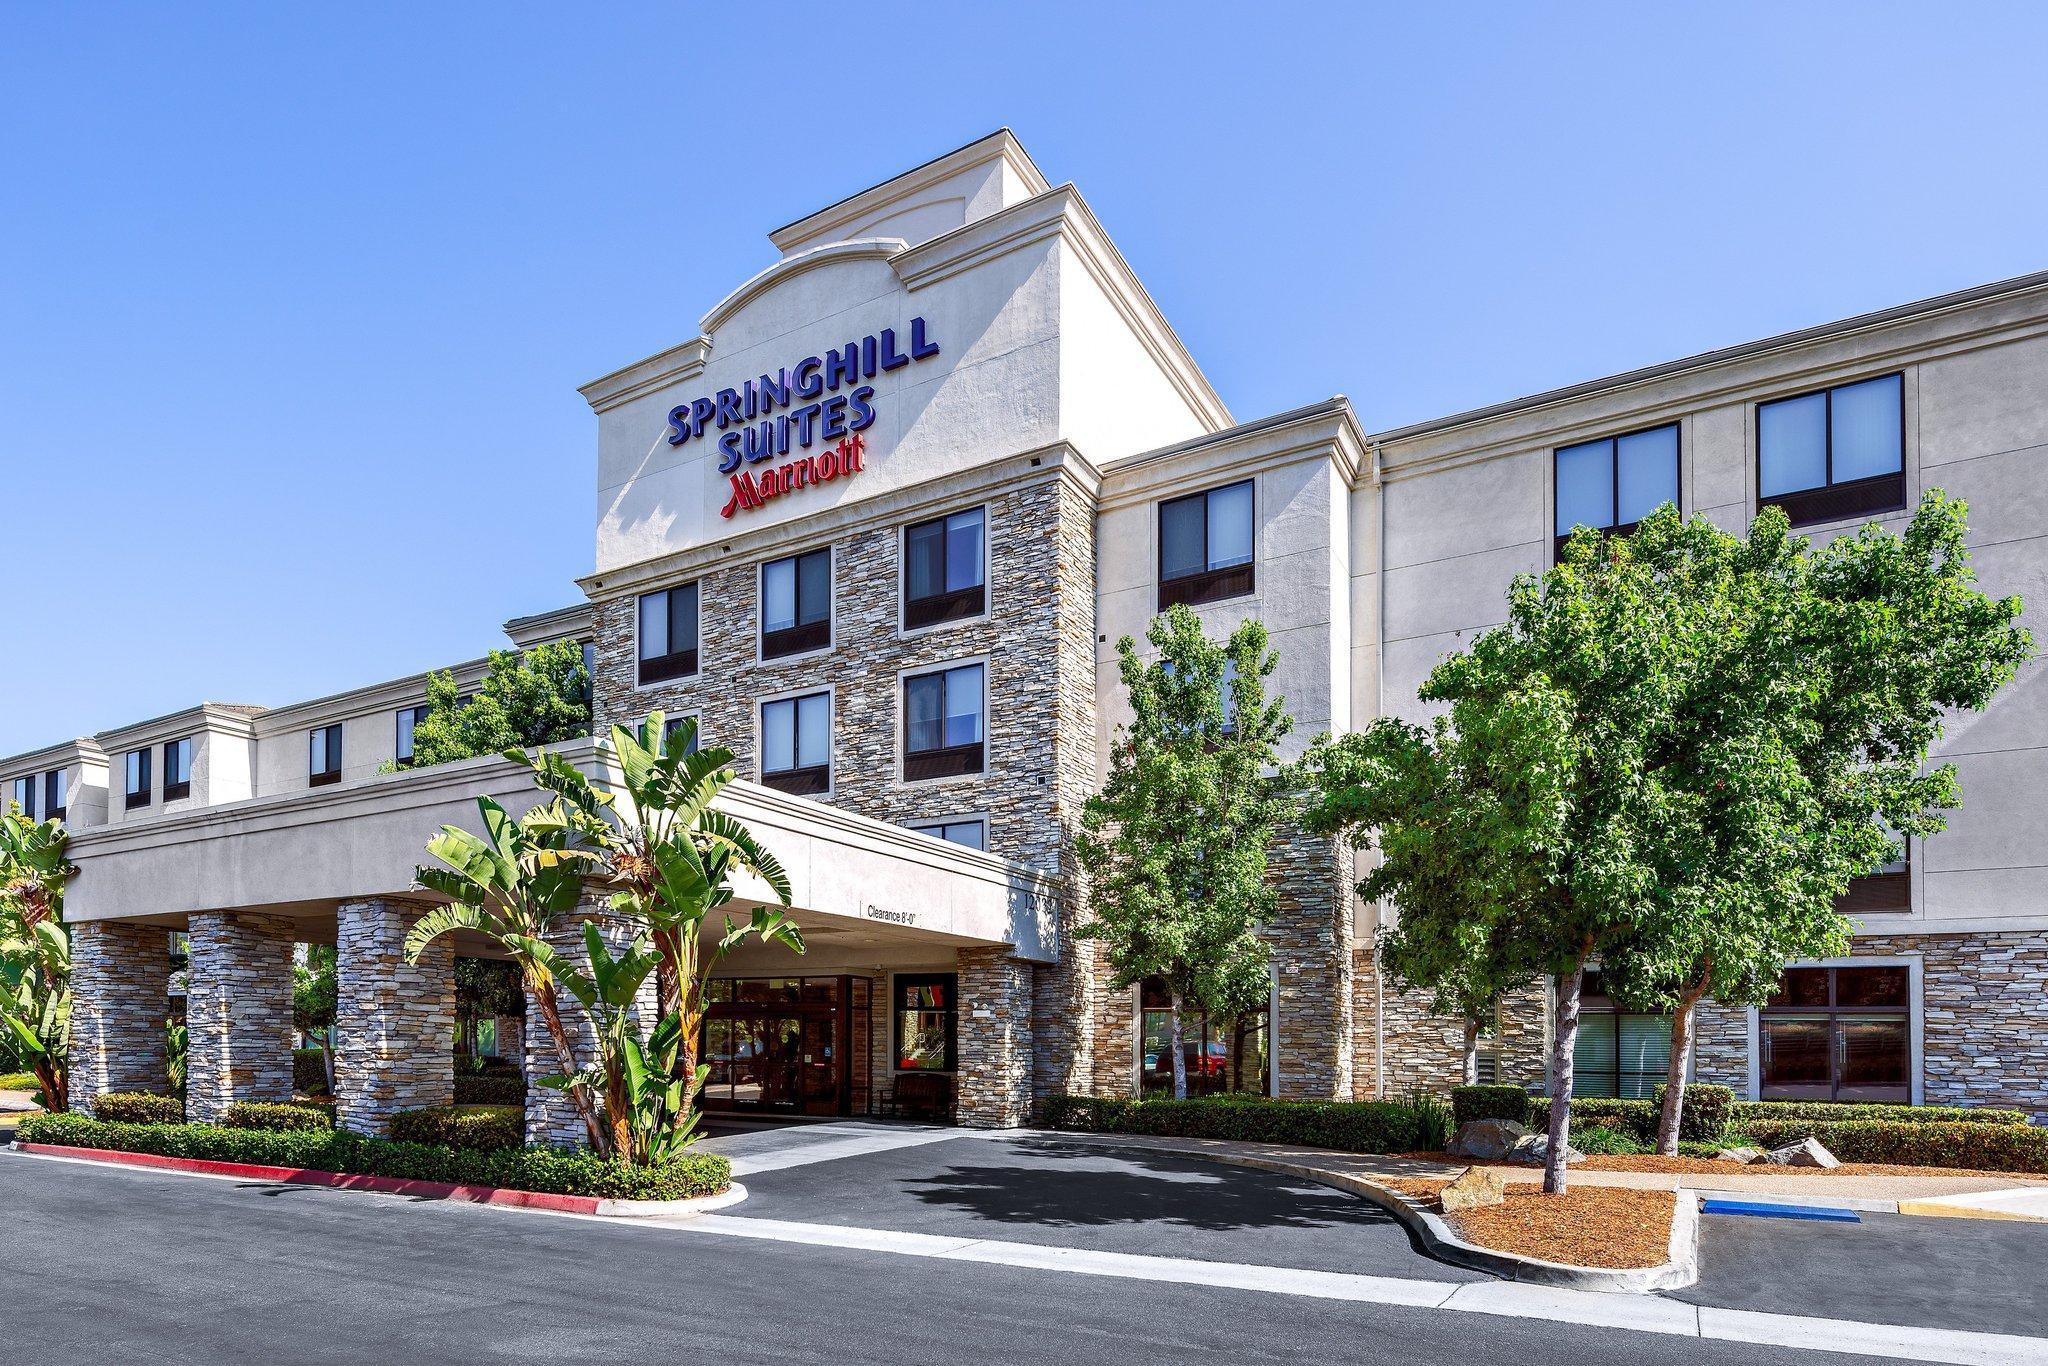 SpringHill Suites San Diego Rancho Bernardo Scripps Poway